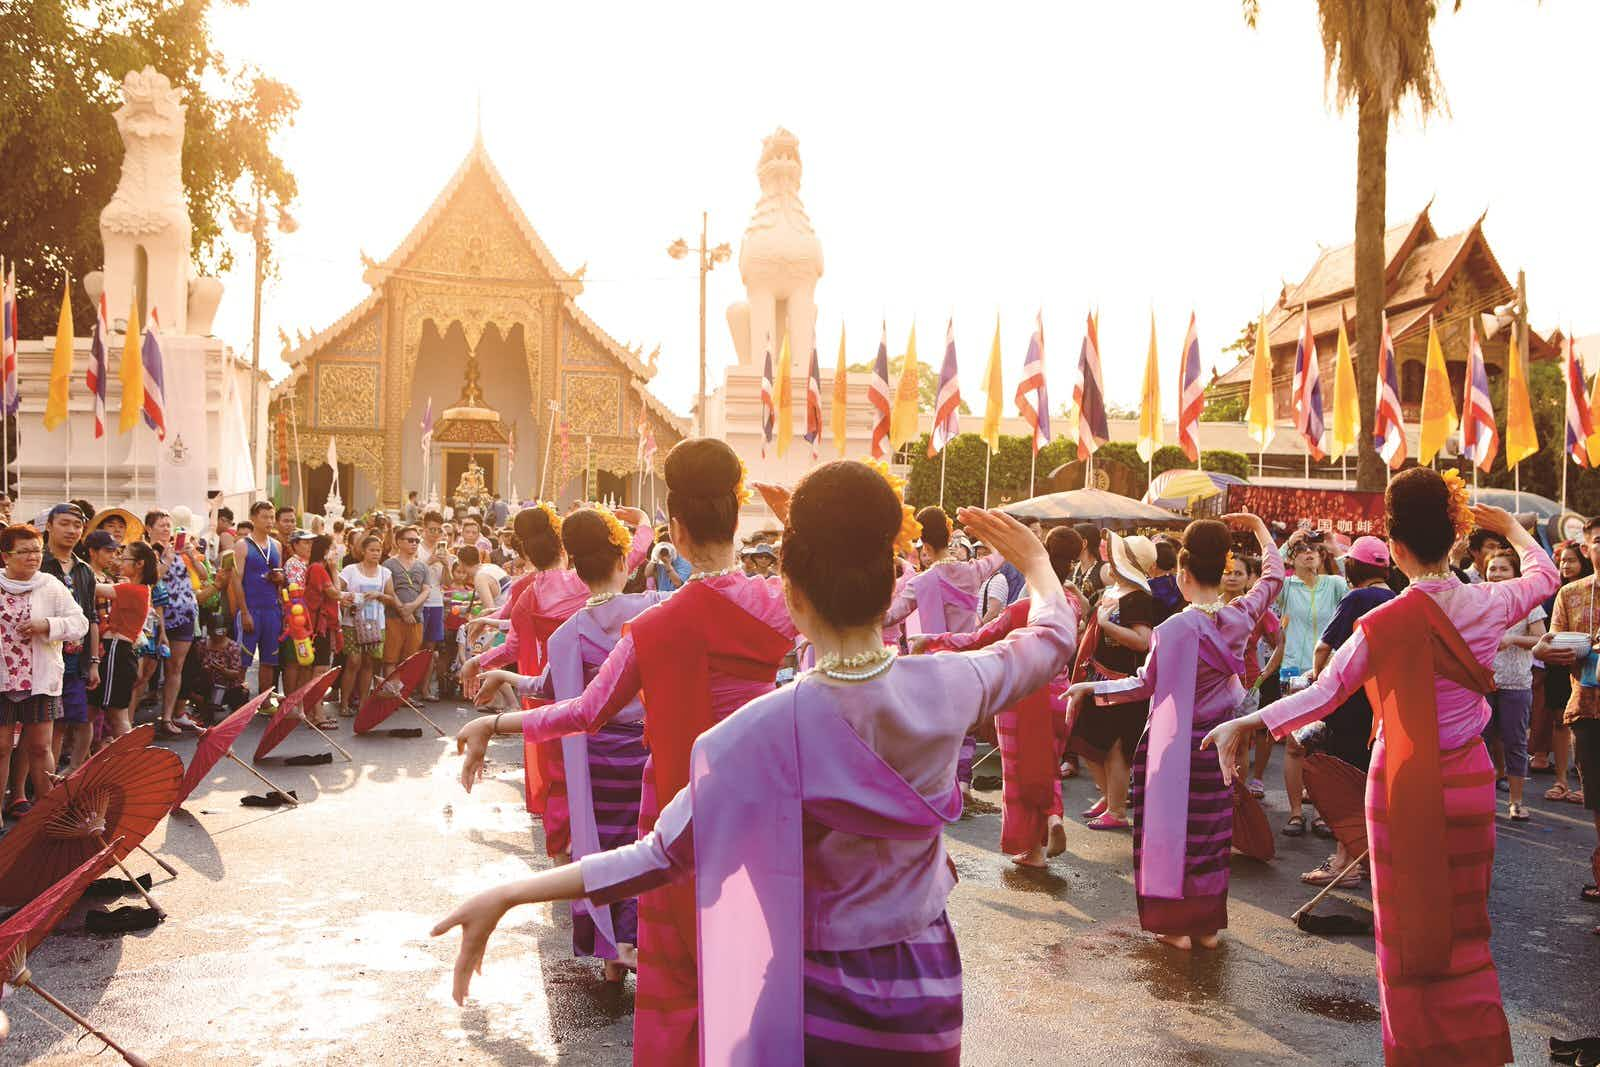 Songkran Festival parade dancers.